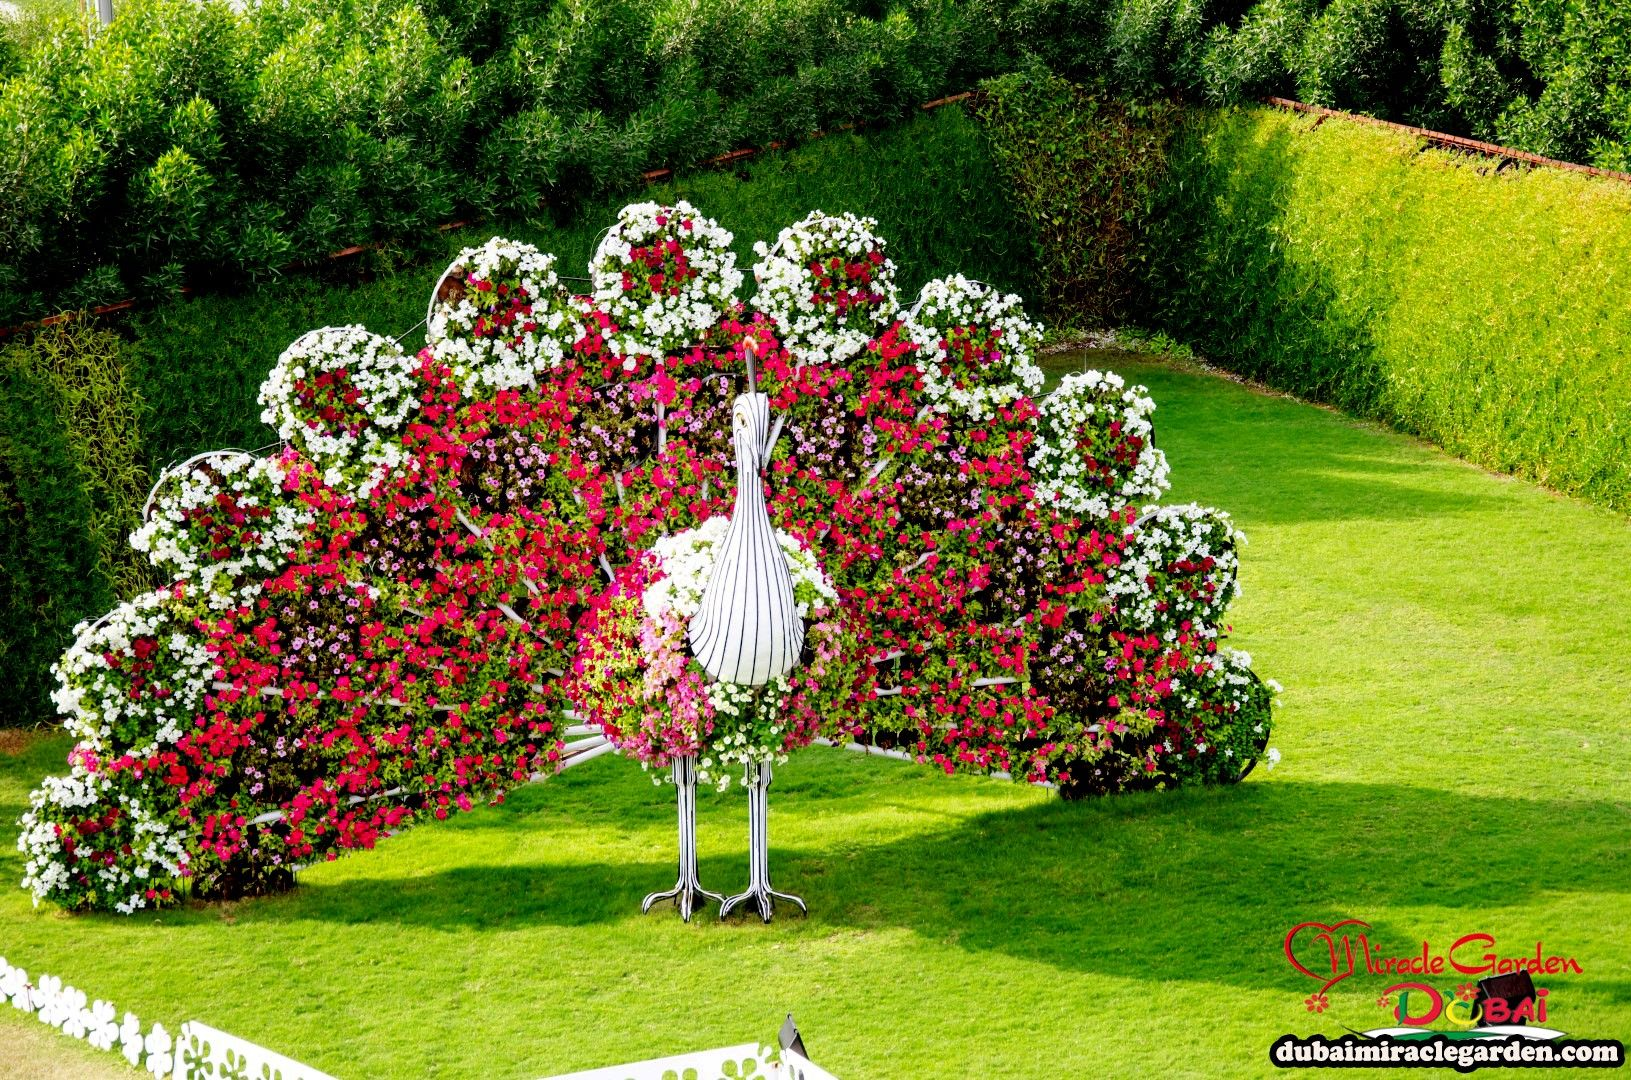 Dubai miracle garden the worlds biggest natural flower